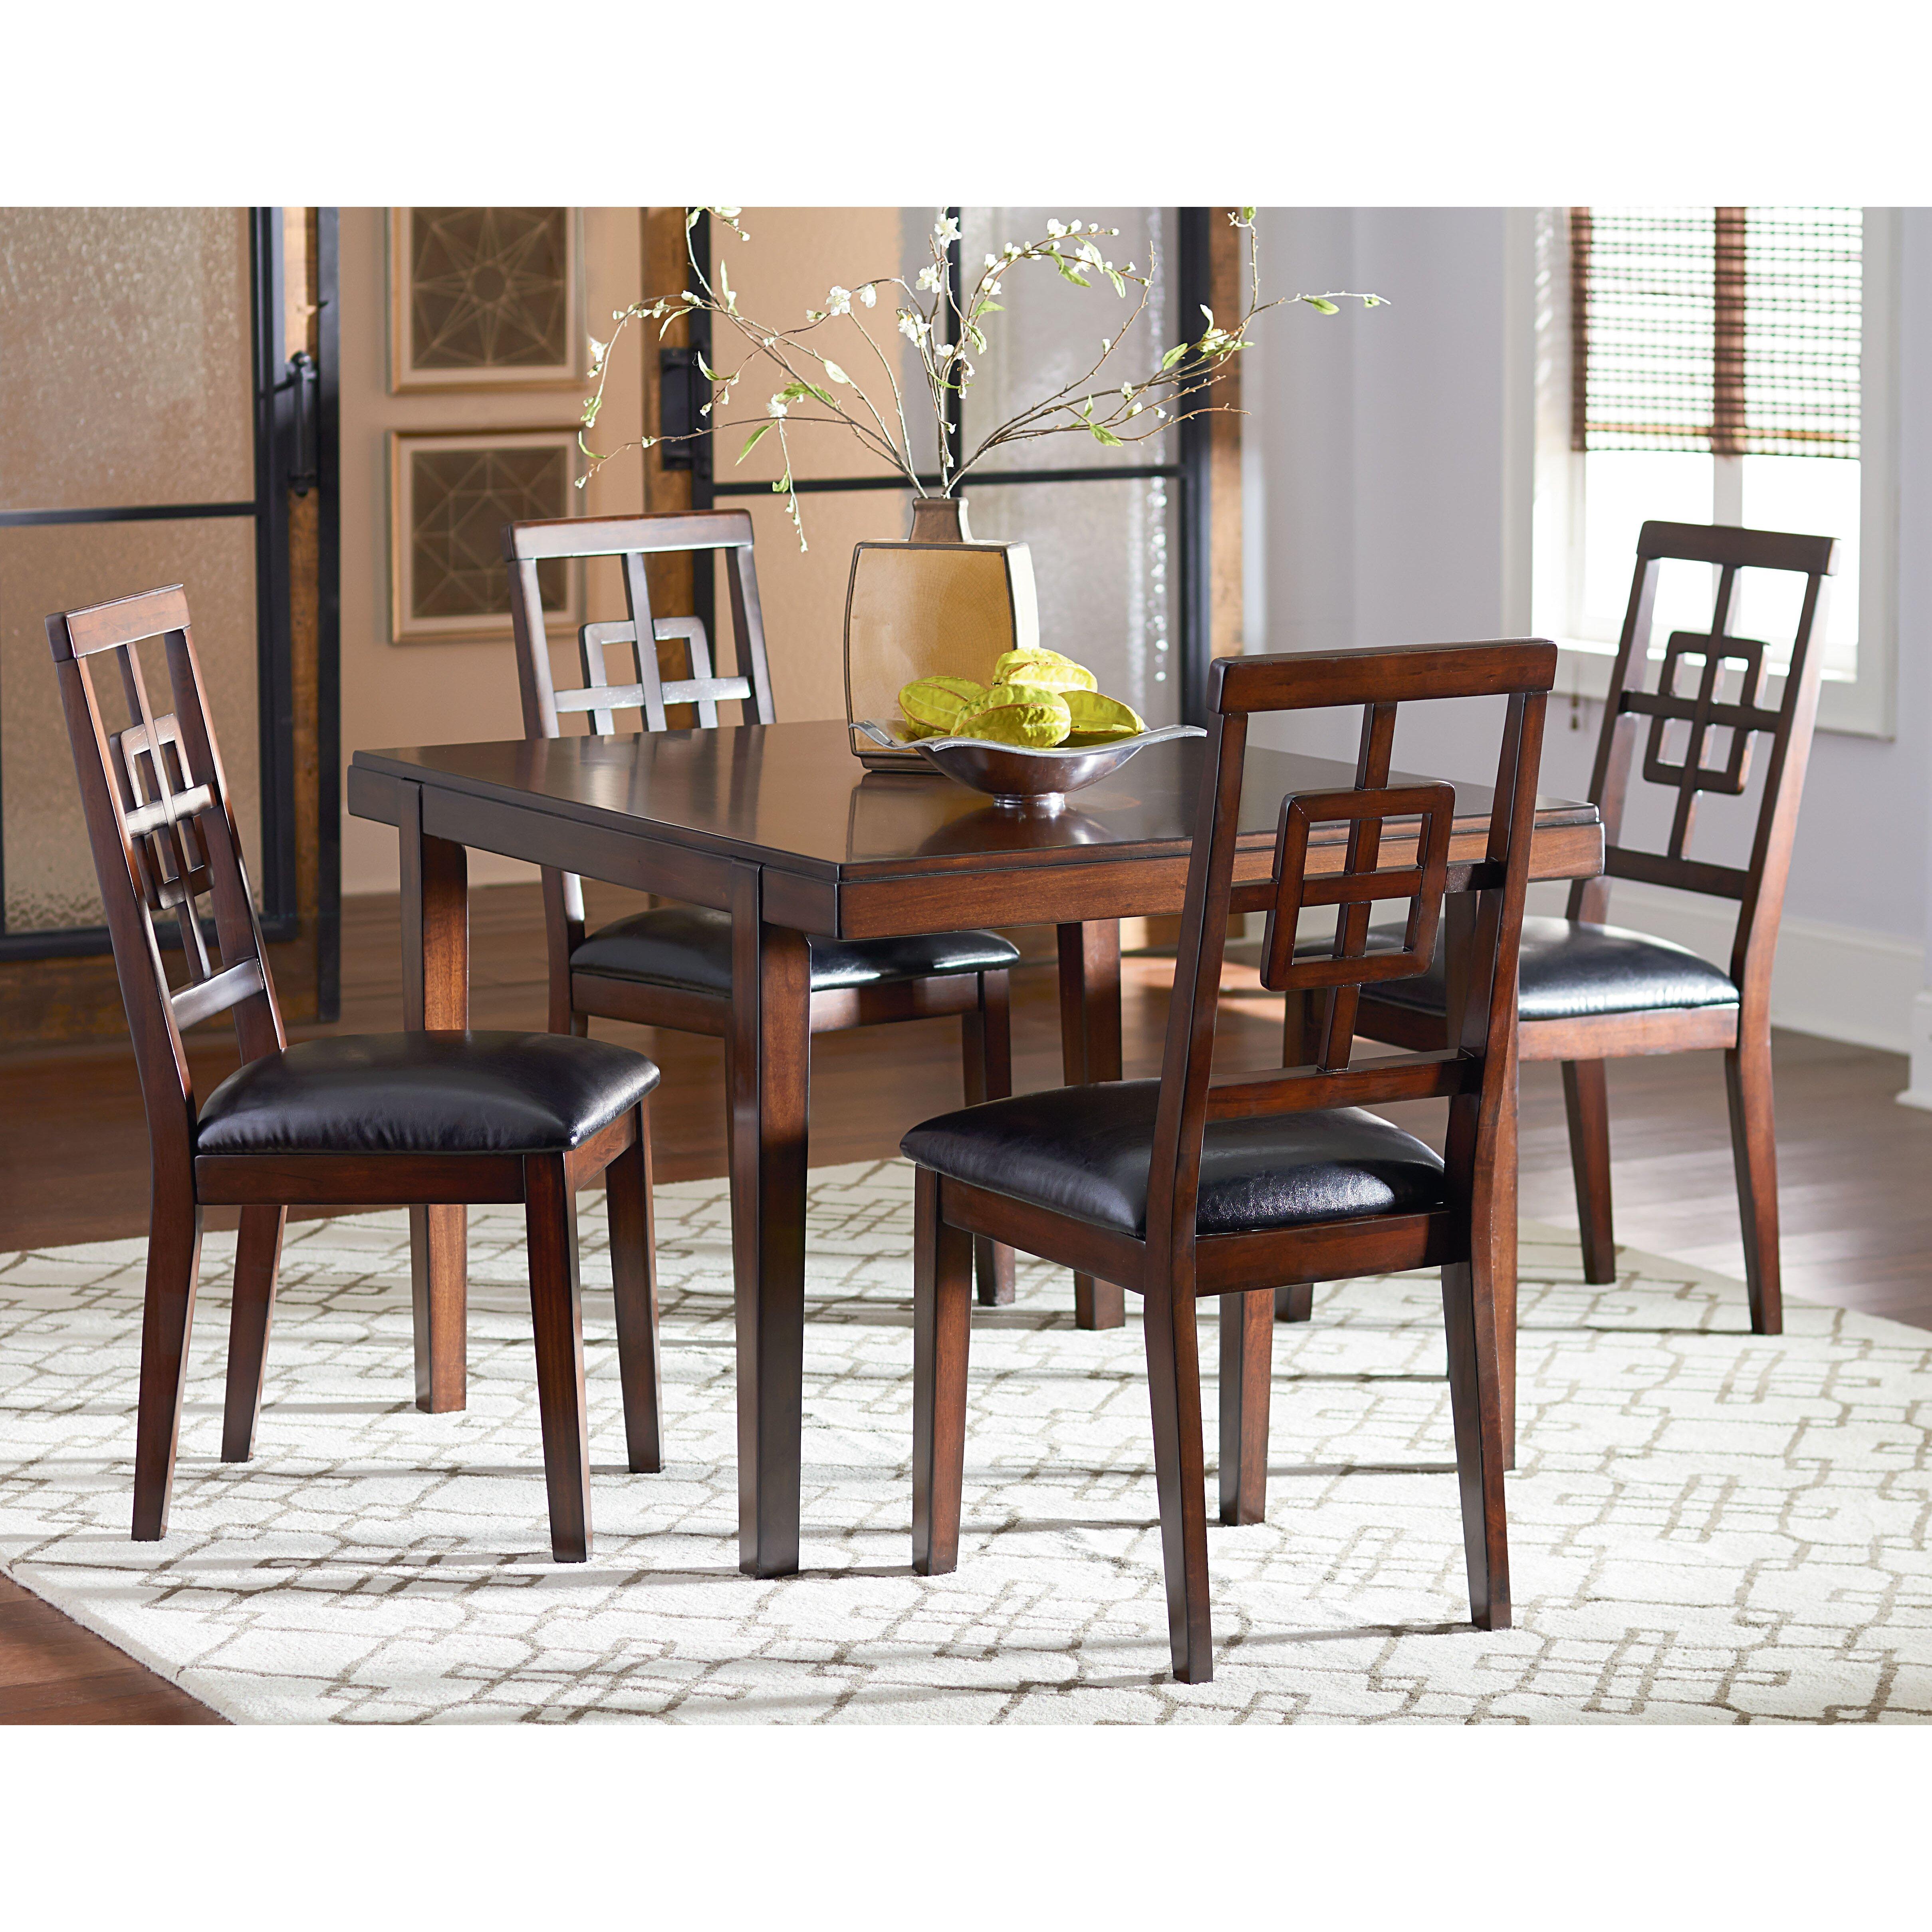 Darby home co remington 5 piece dining set reviews wayfair for 5 piece dining set